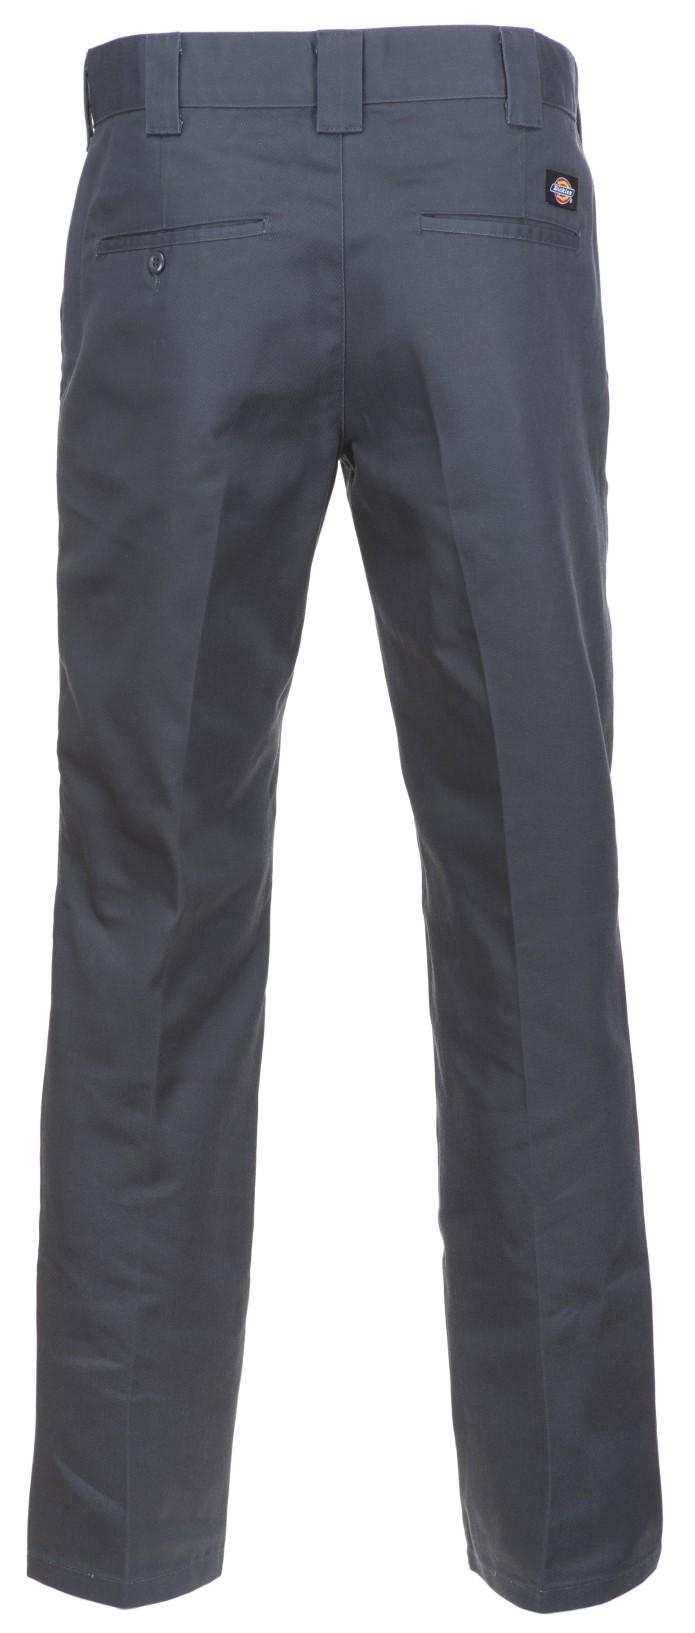 Dickies-Herren-Chino-Stoff-Hose-Arbeitshose-SLIM-FIT-WORK-PANT Indexbild 8